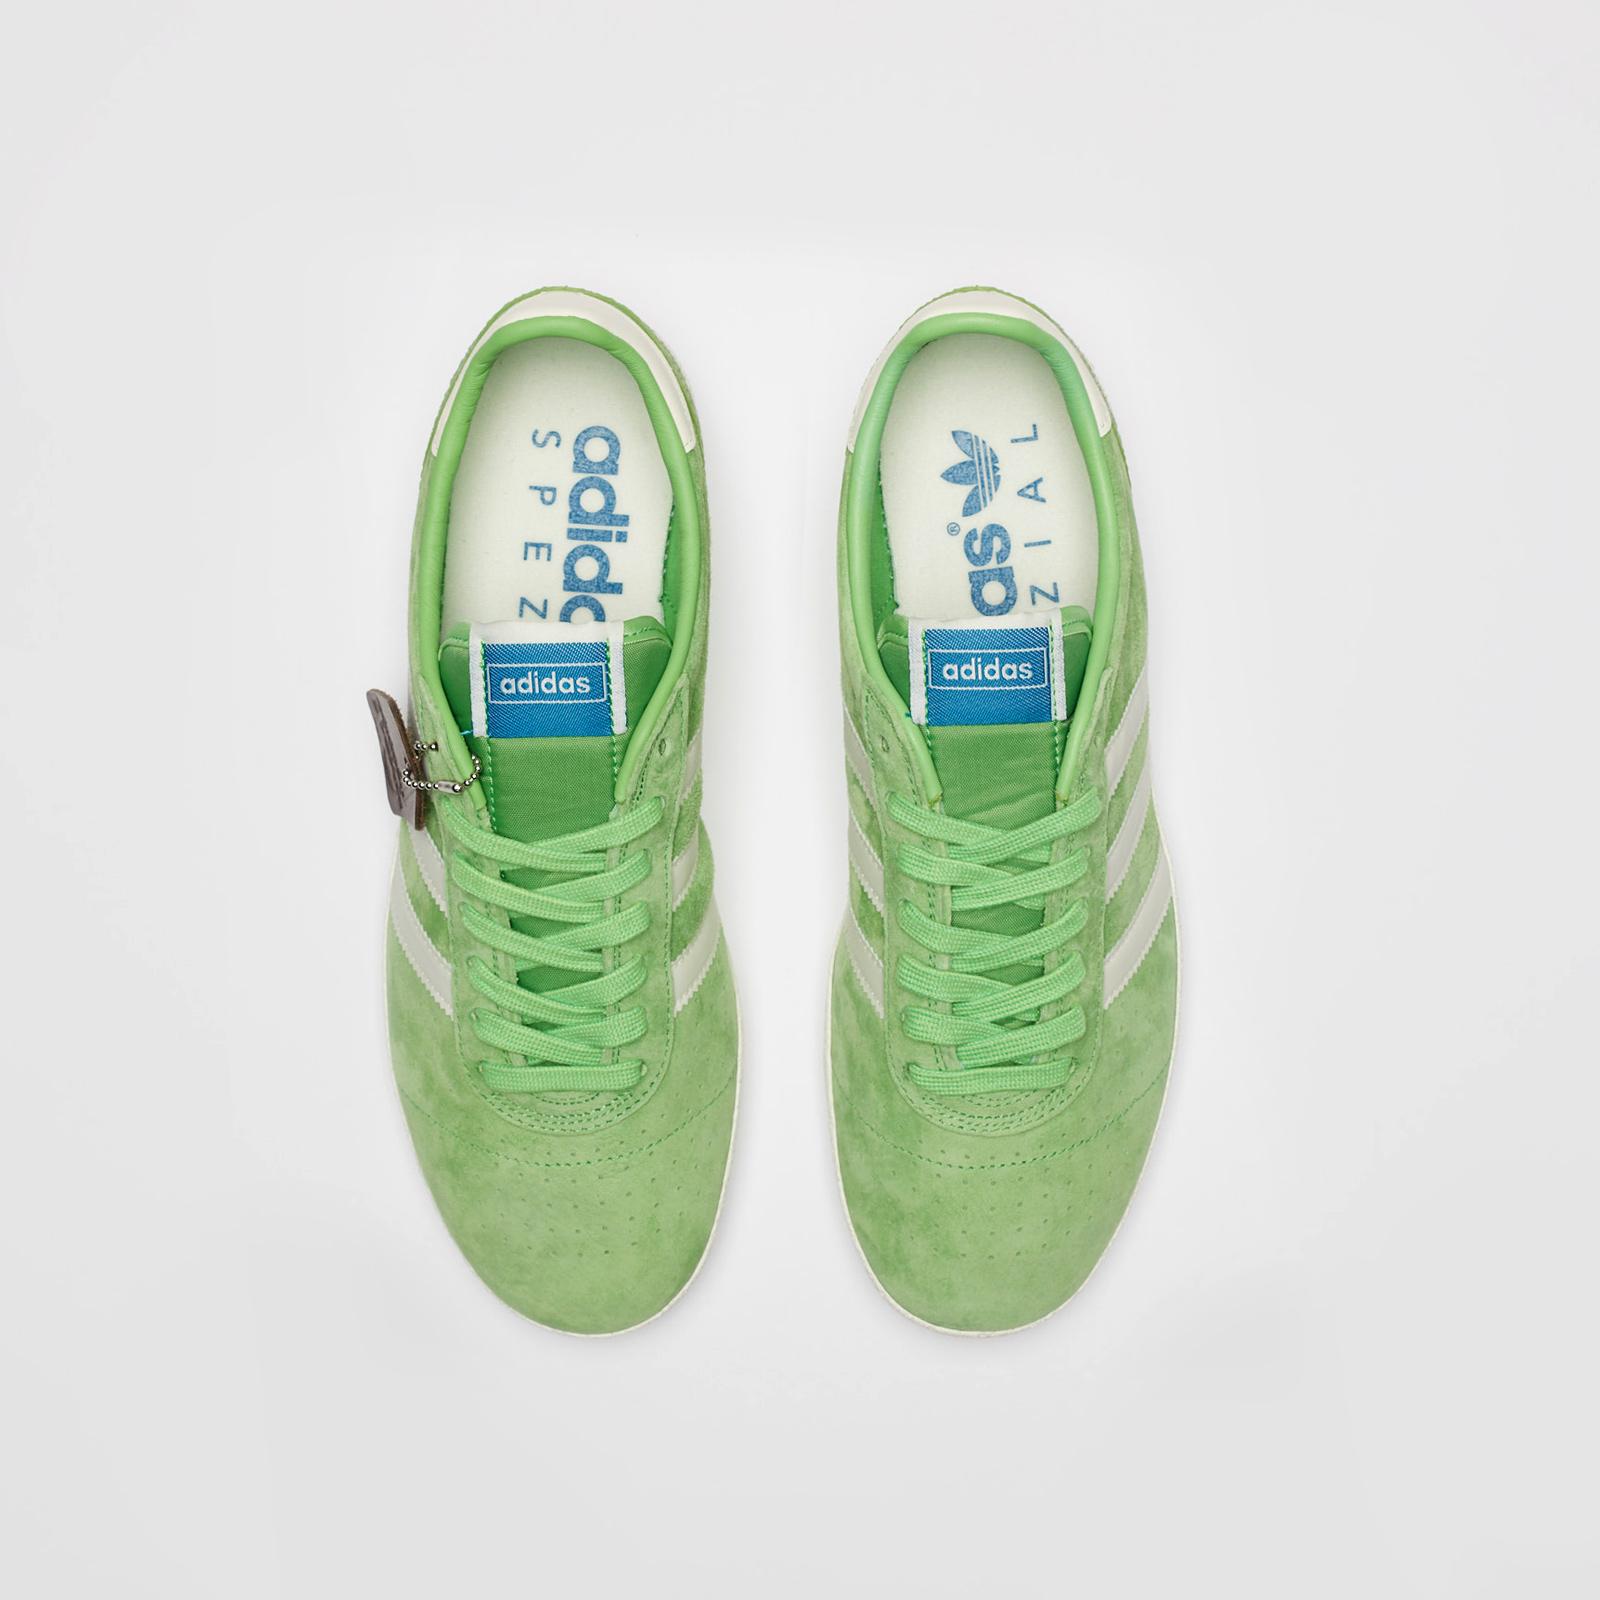 A gran escala formal Hablar con  adidas Munchen Super - B41810 - Sneakersnstuff | sneakers & streetwear  online since 1999